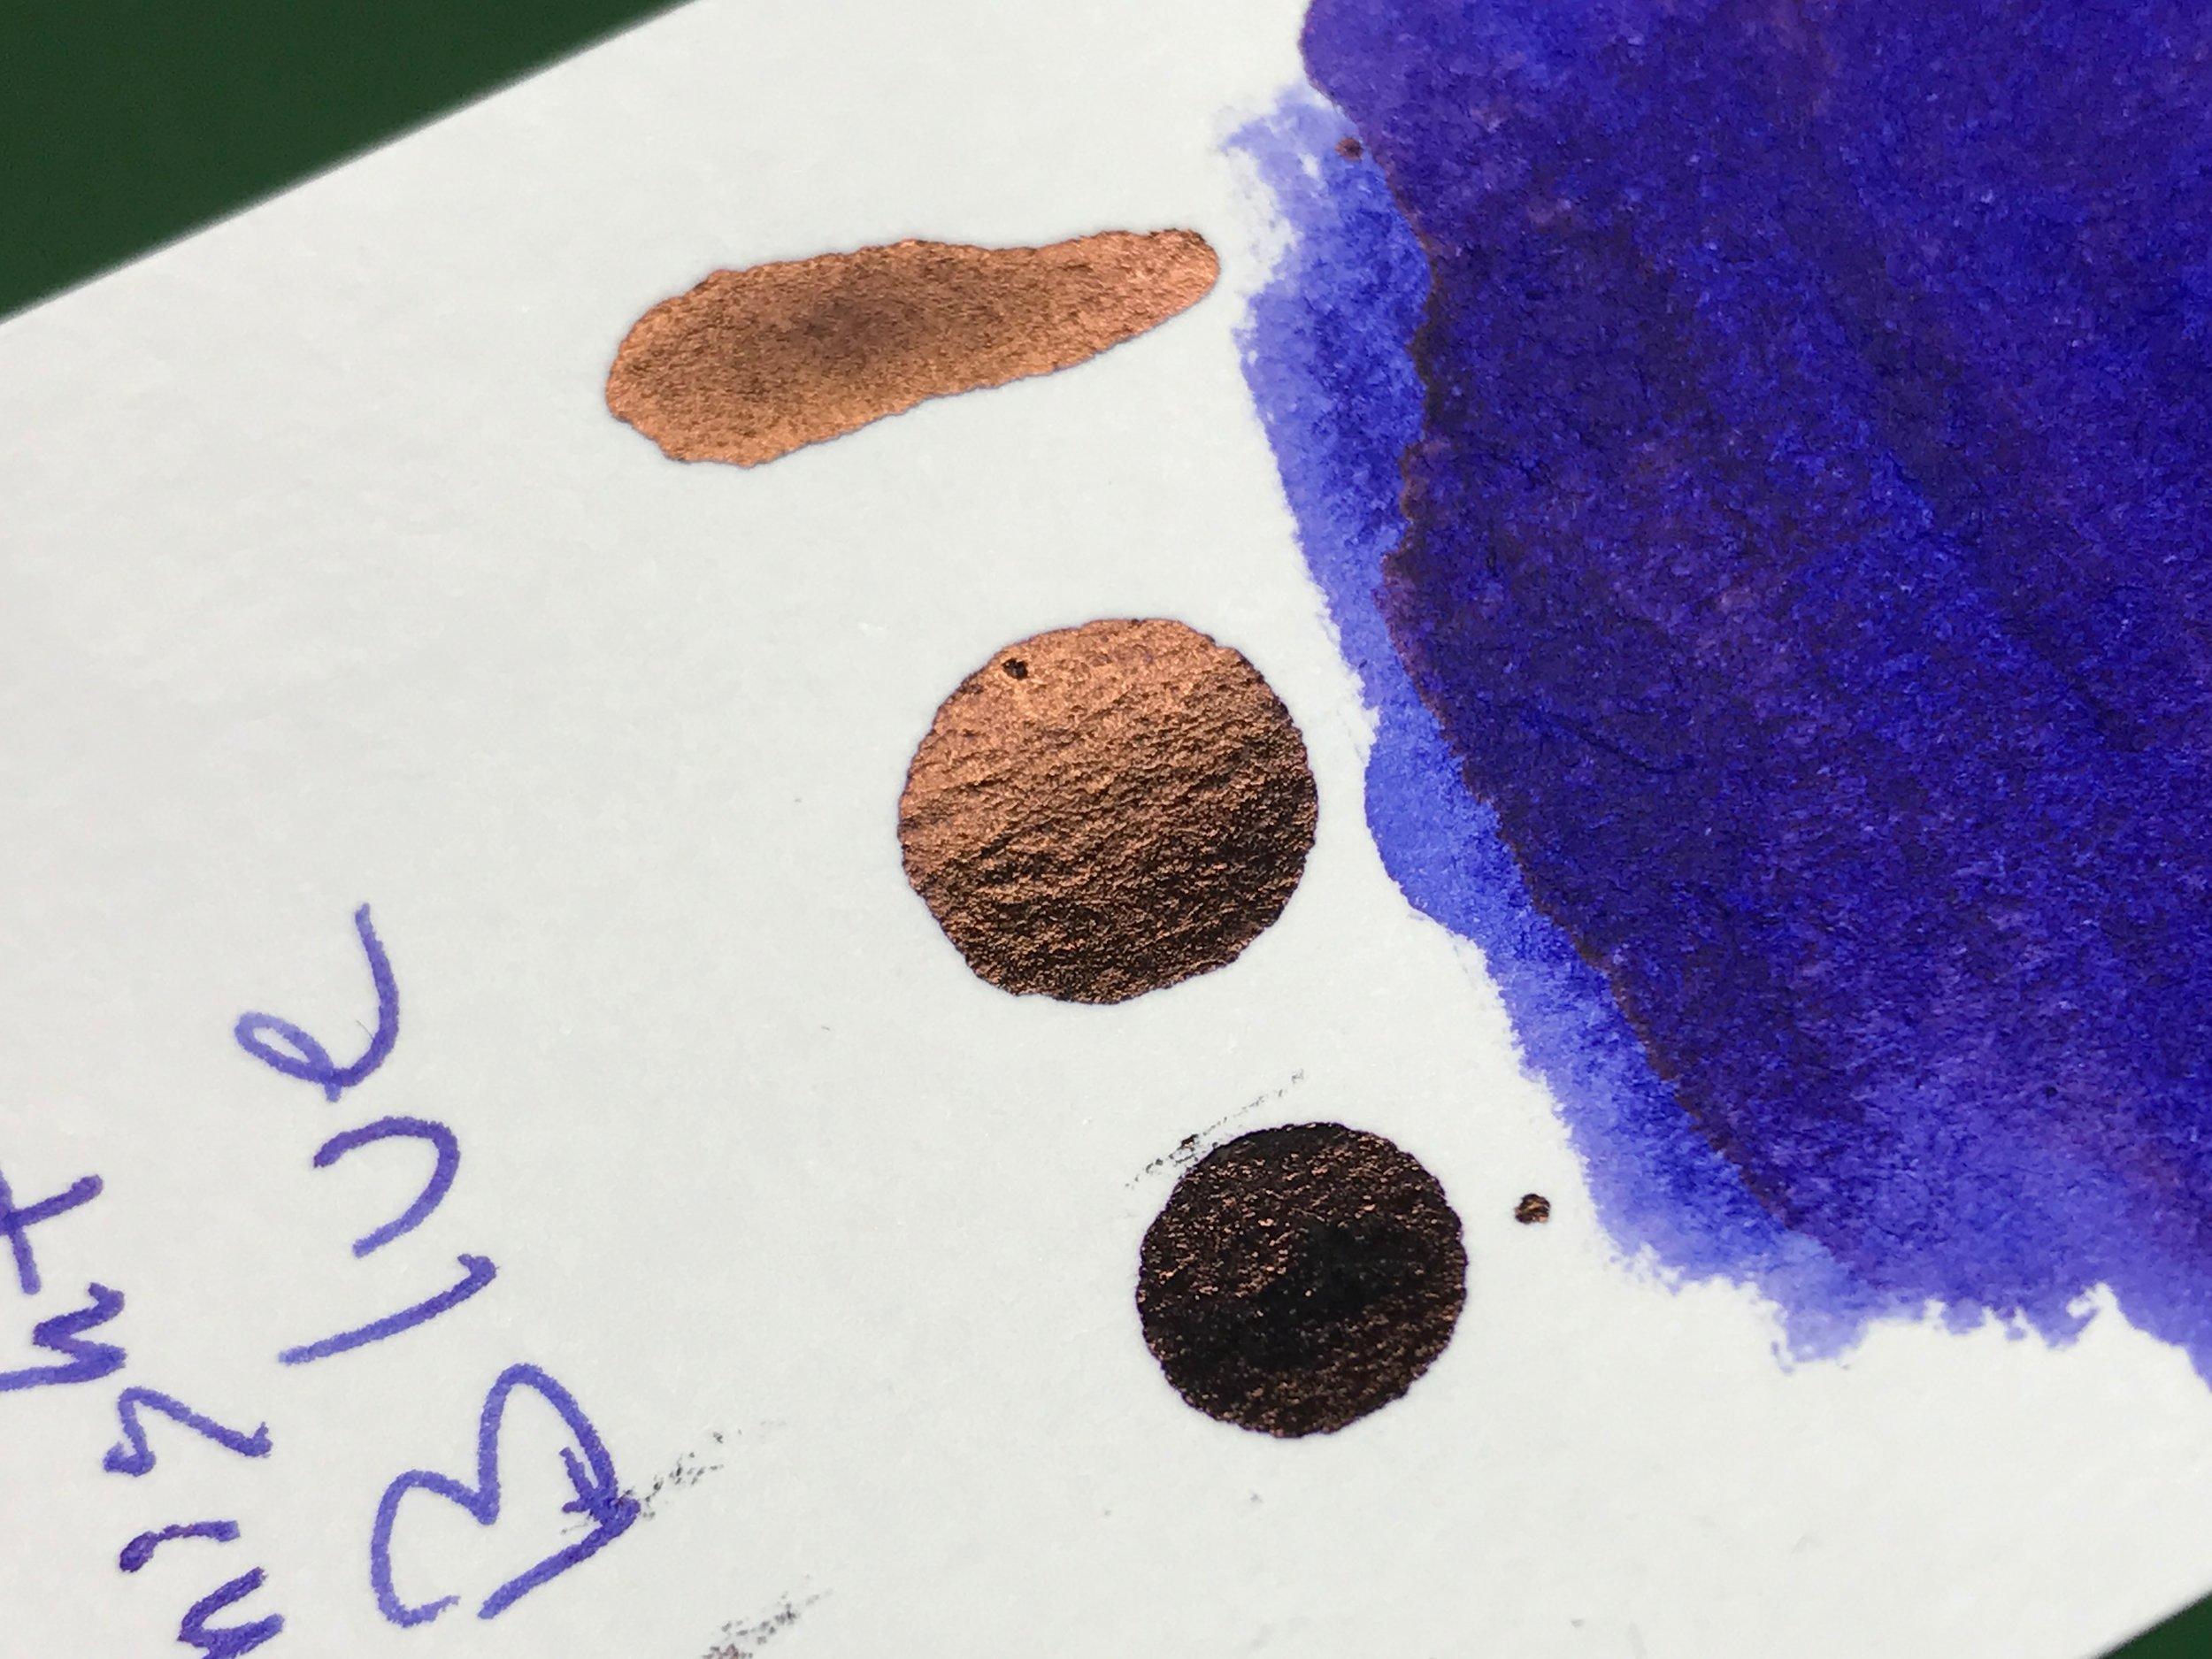 col-o-ring-ink-testing-book-15.jpg